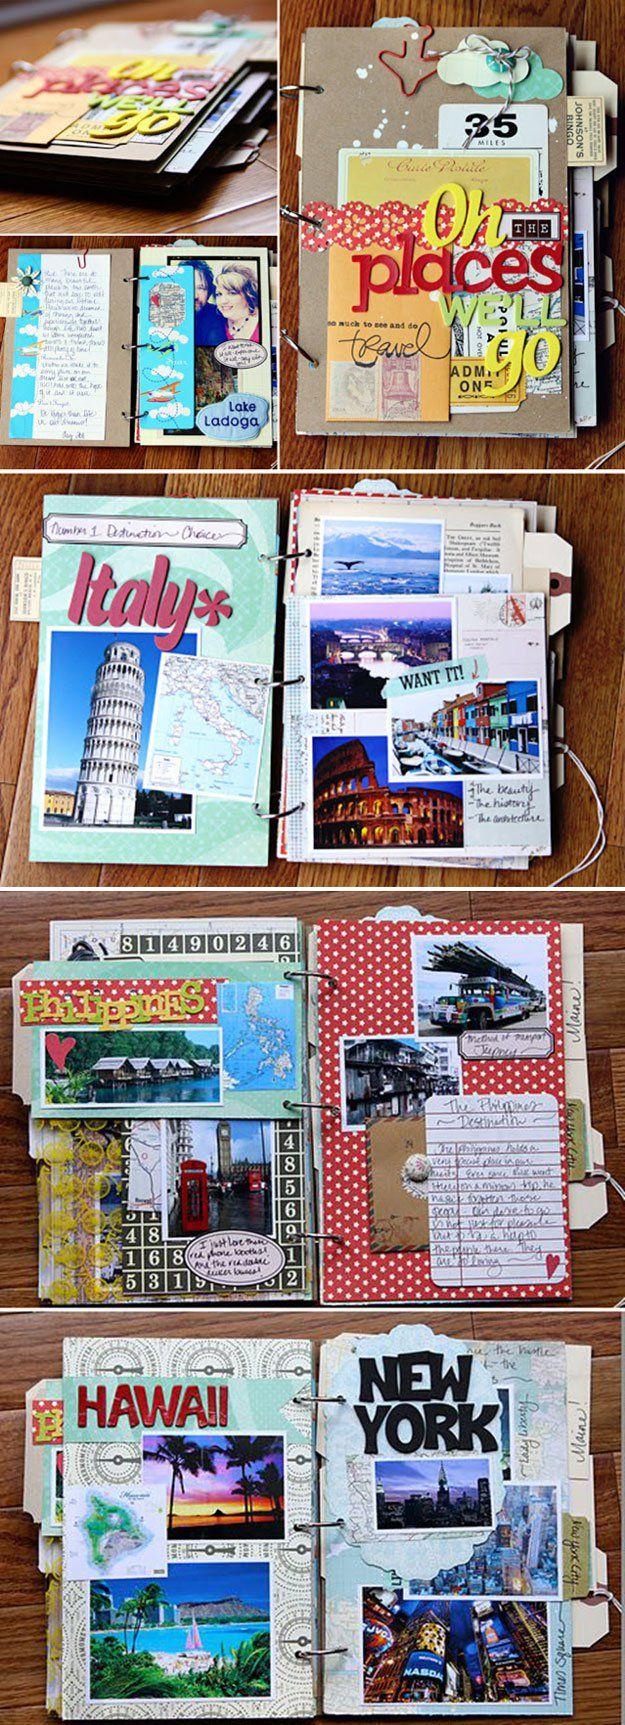 Cute and Easy Scrapbook Design Tutorial | http://diyready.com/cool-scrapbook-ideas-you-should-make/